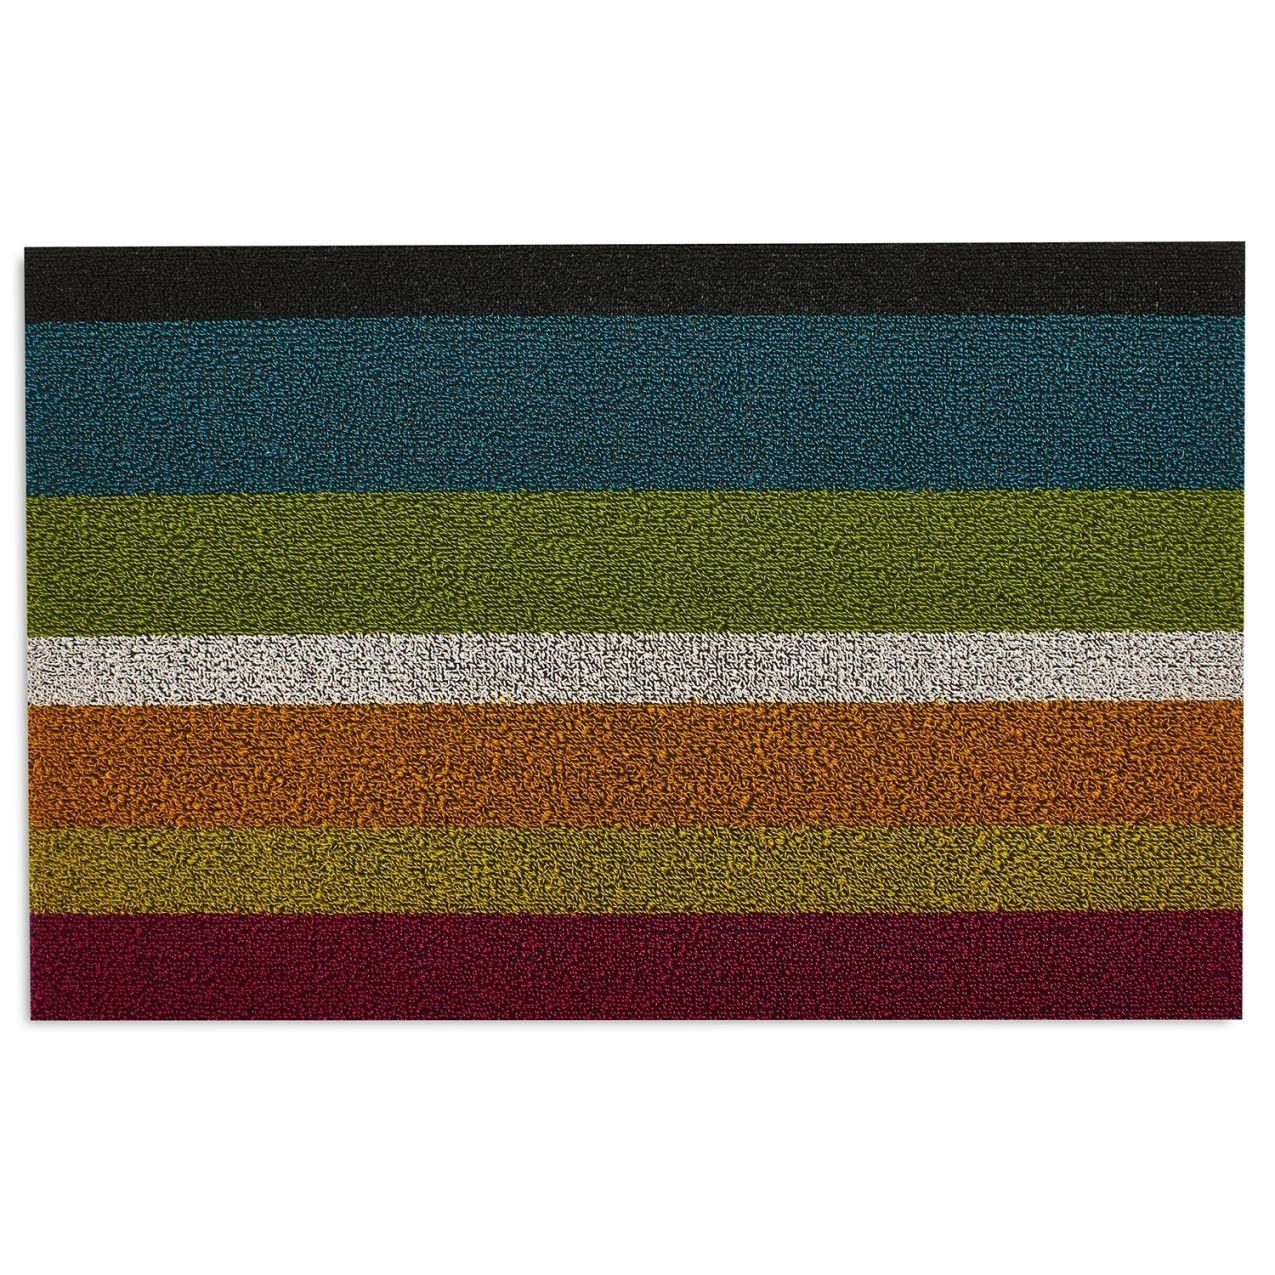 multi-colored striped doormat